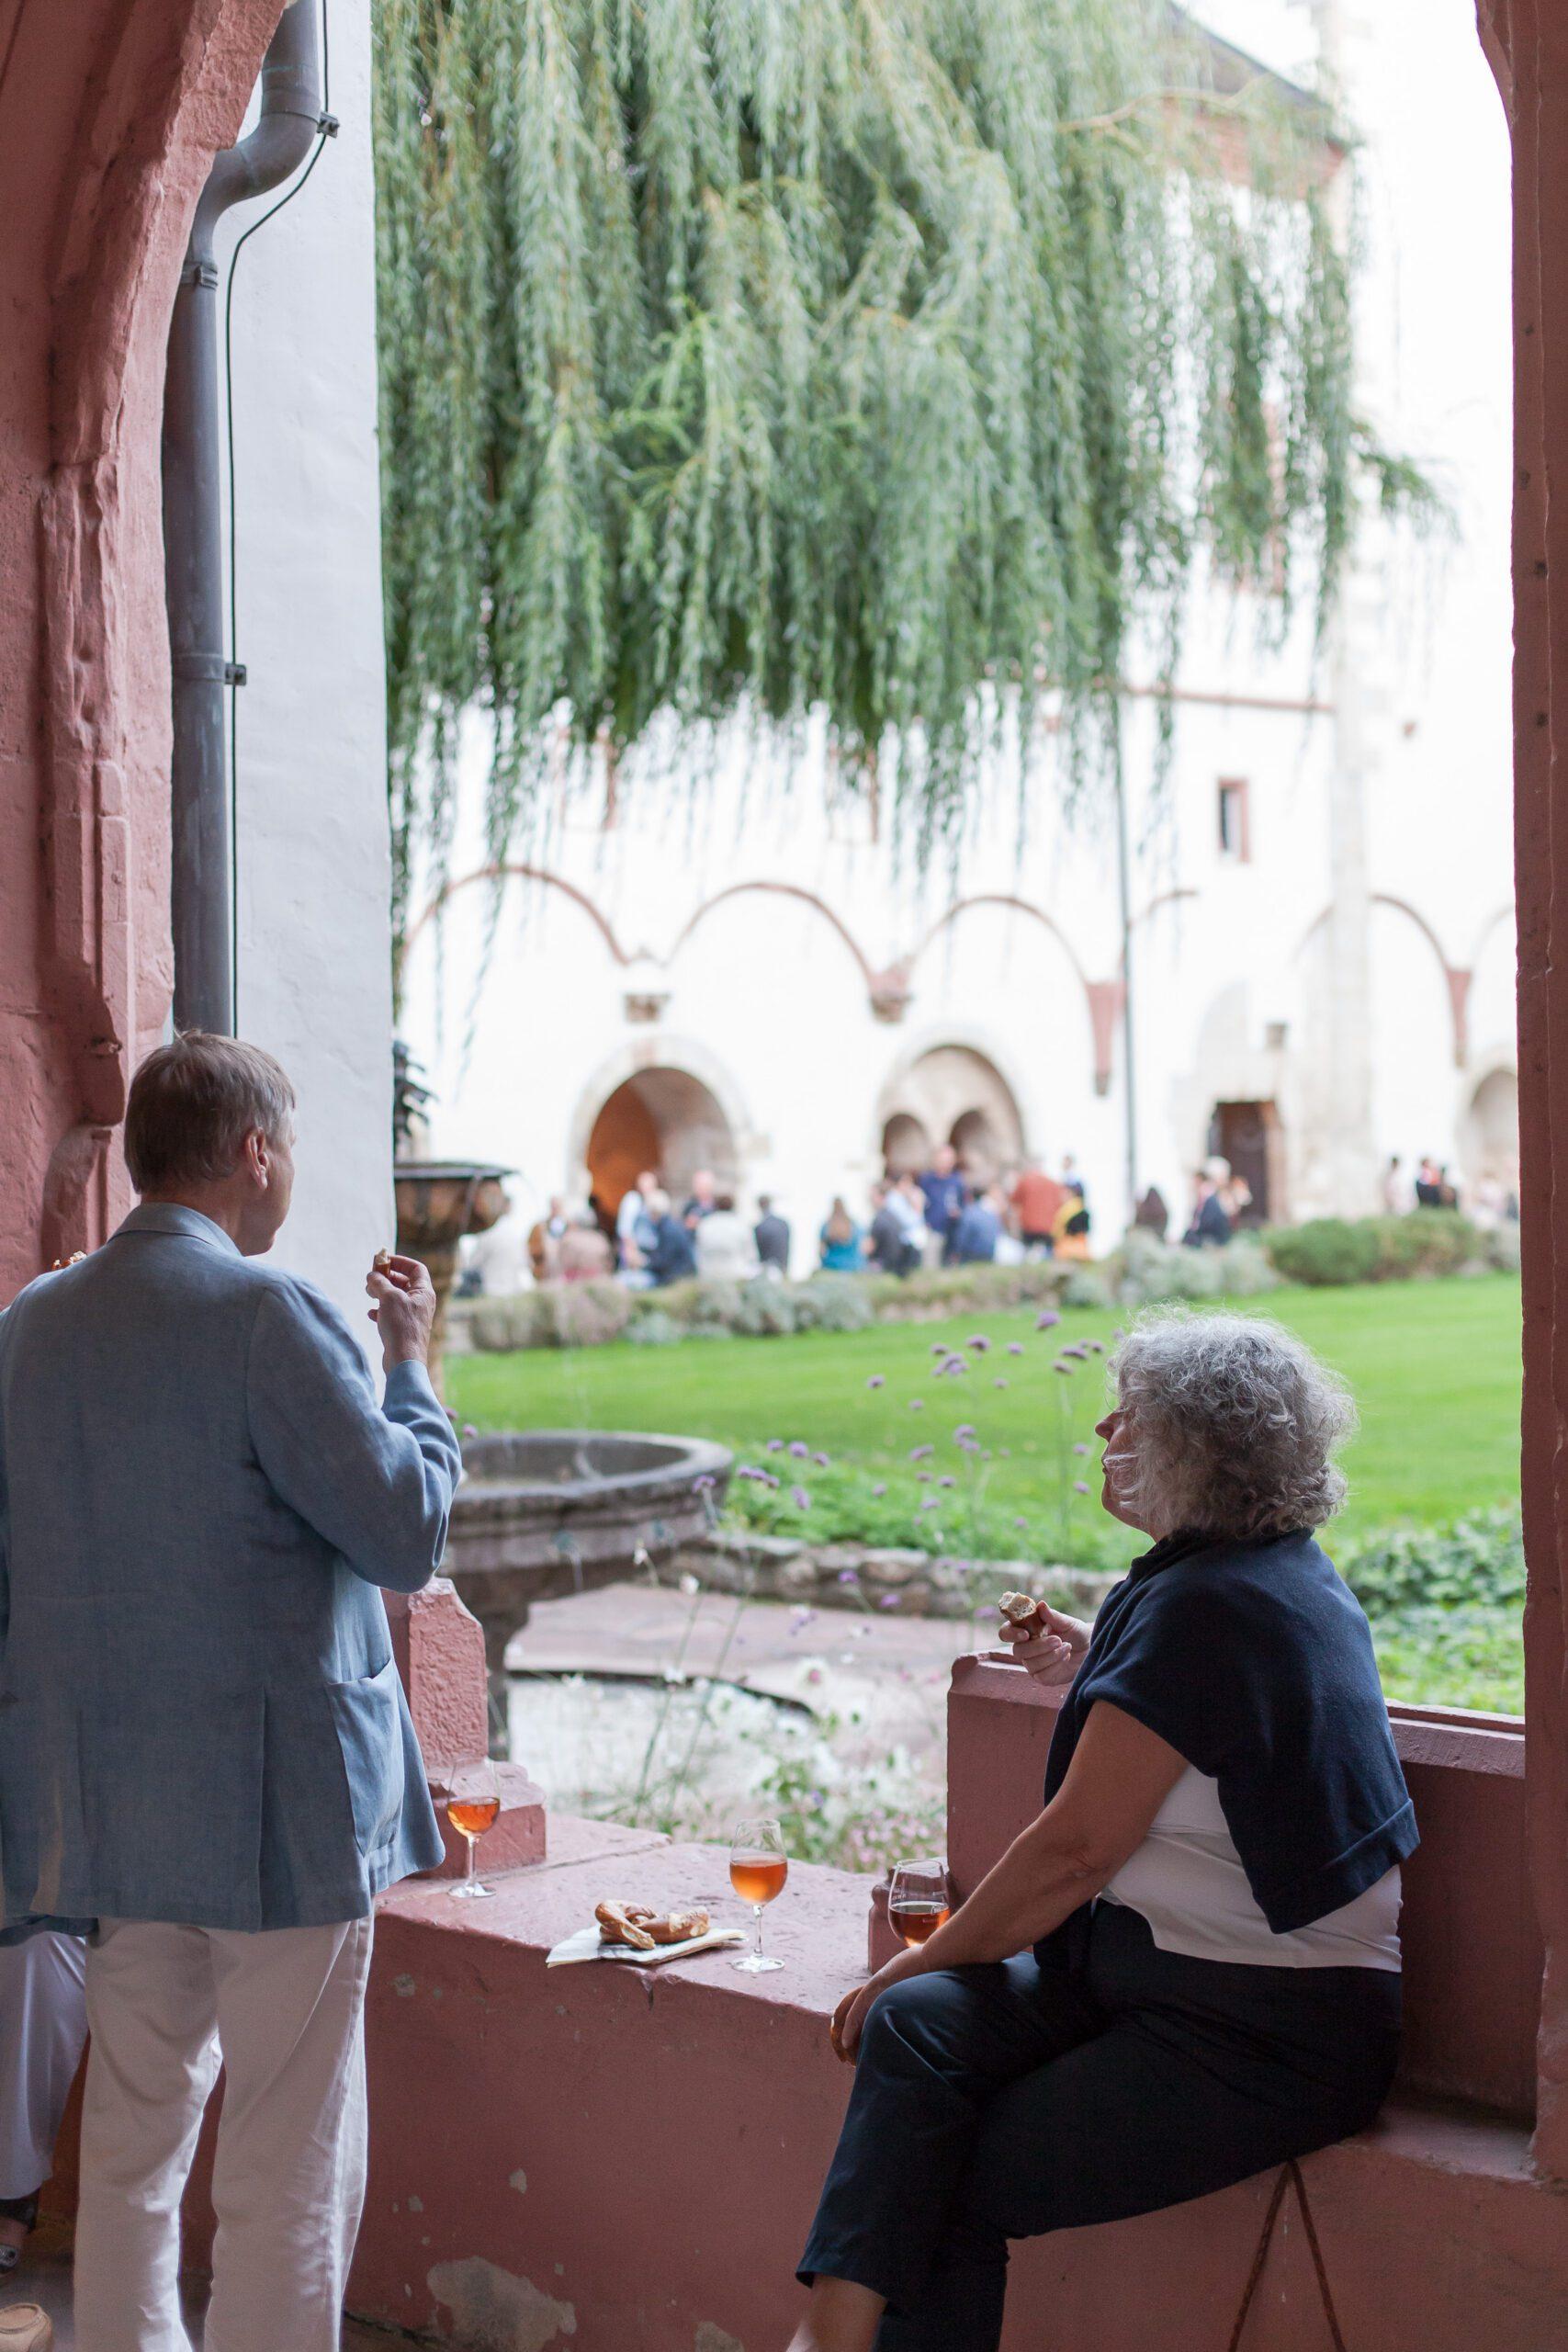 Jörg Schellschmidt - Eventfotografie - Kinosommer Kloster Eberbach 2012